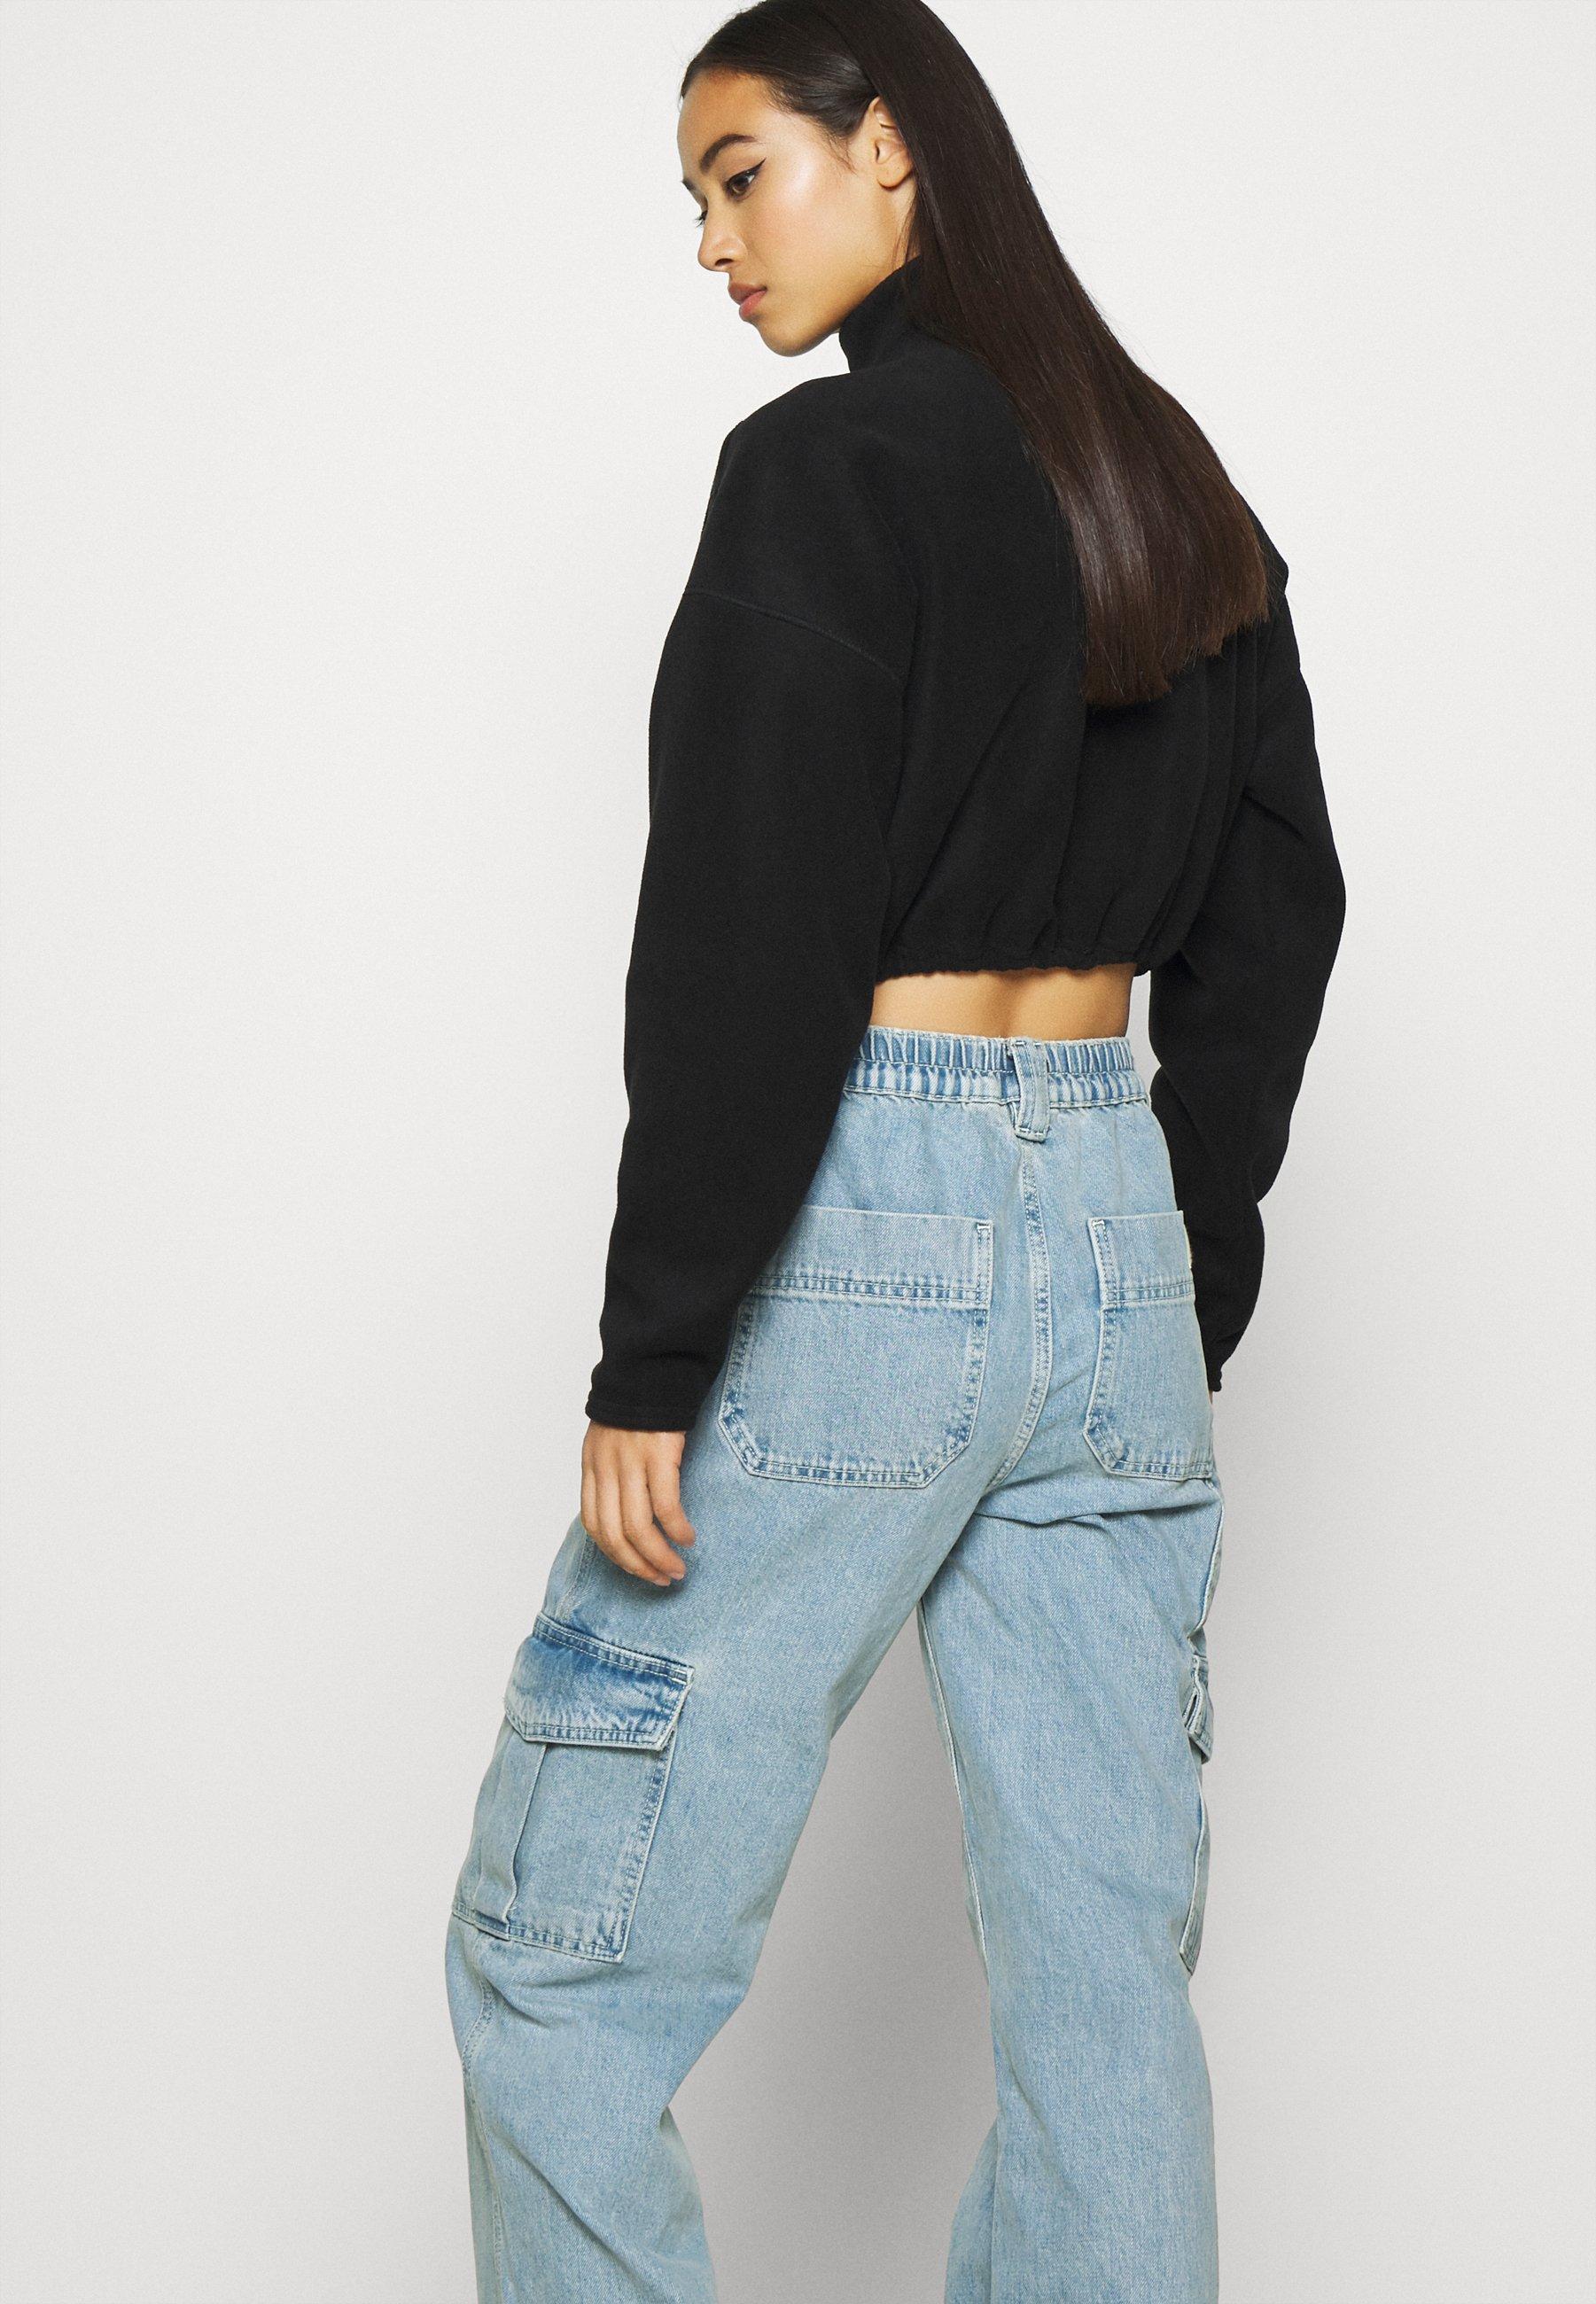 Bdg Urban Outfitters Skate Jean Pantalones Cargo Bleach Pantalones De Mujer Rm6iz